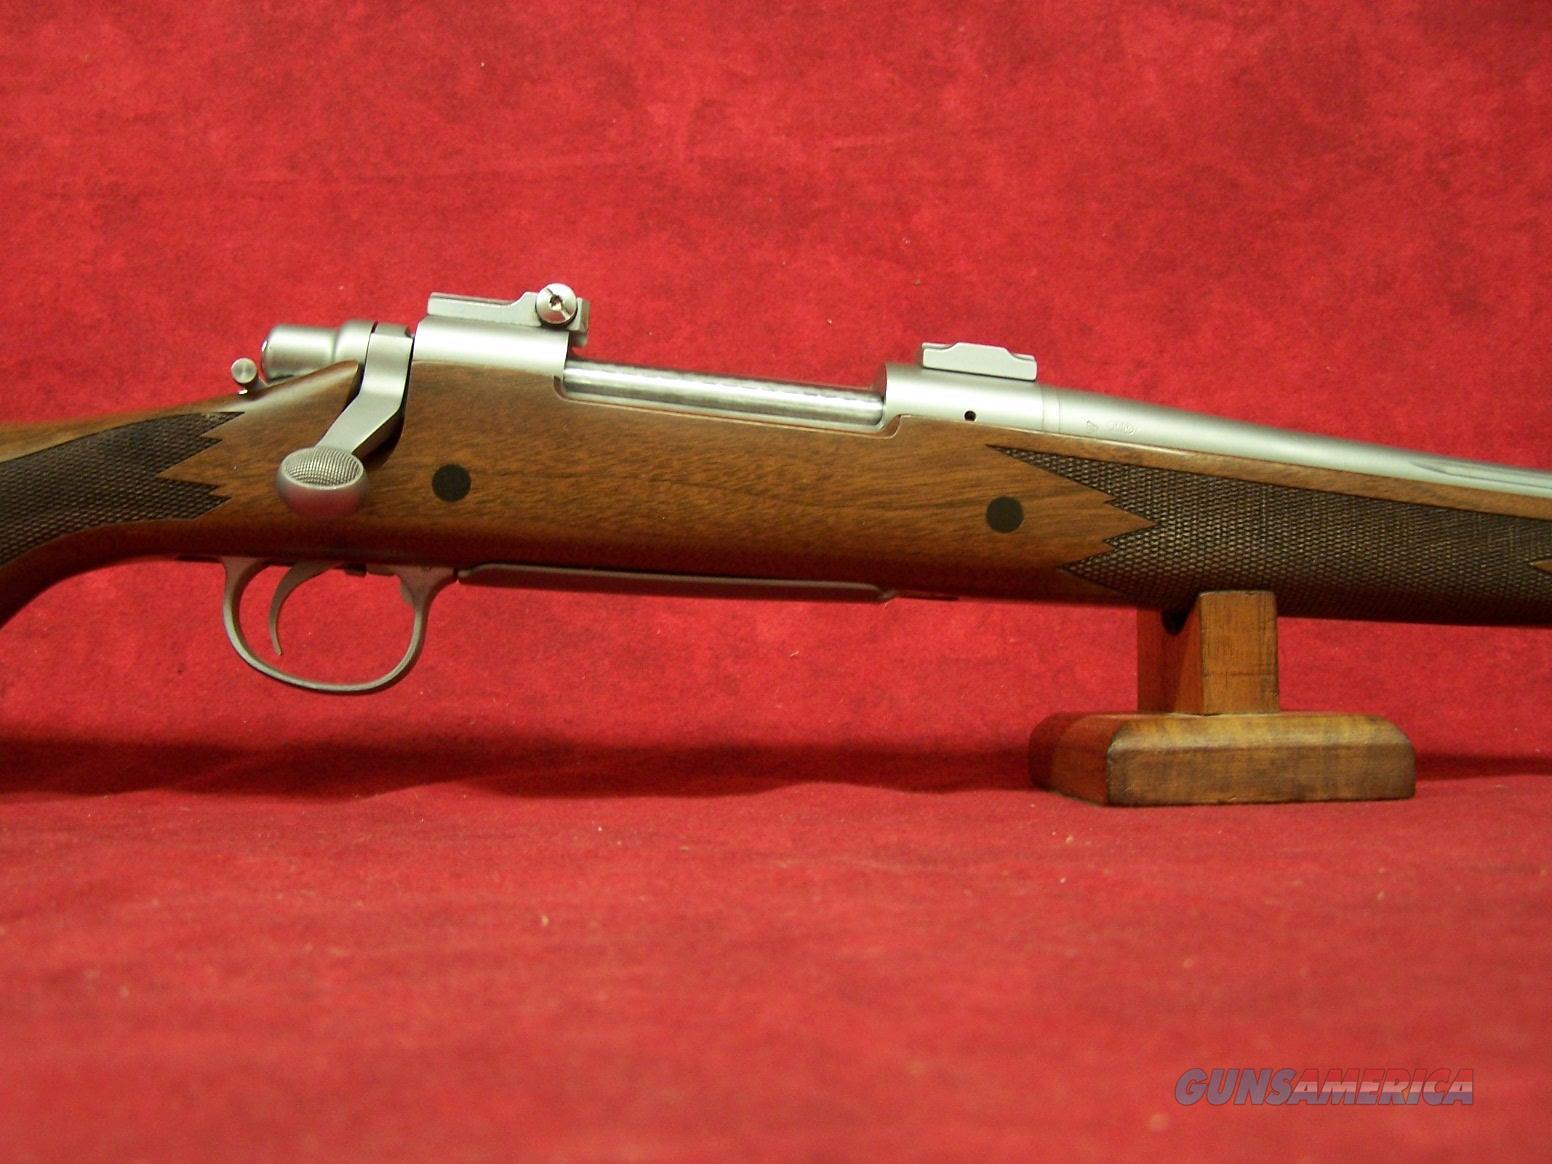 "Remington 700 CDL SF 30-06 24"" FLUTED SS WALNUT (84015)  Guns > Rifles > Remington Rifles - Modern > Model 700 > Sporting"